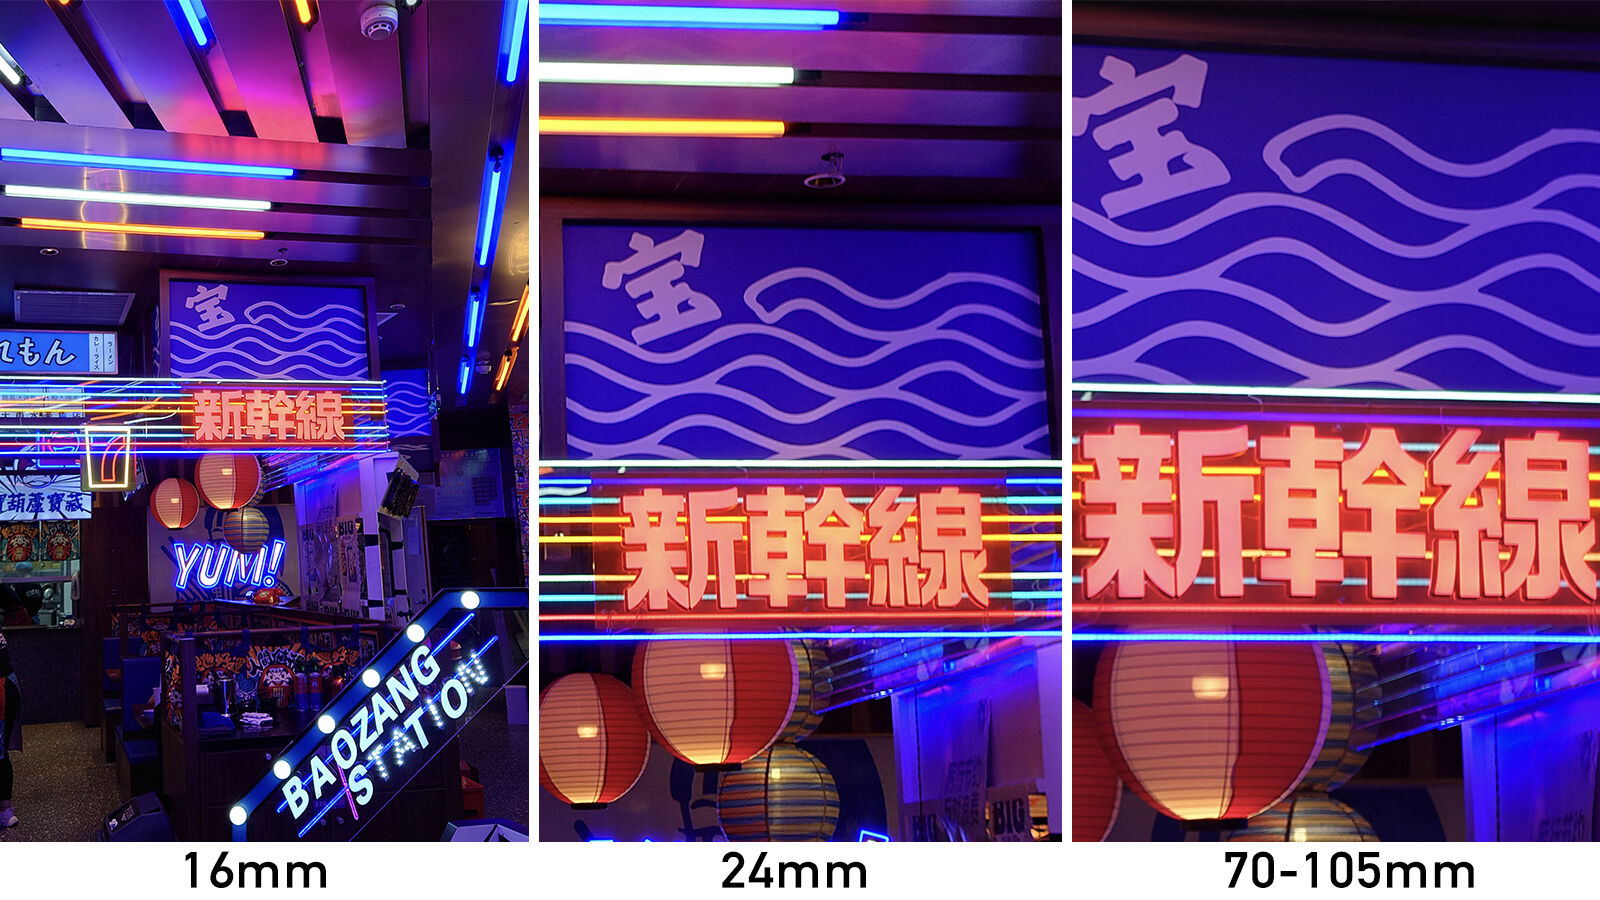 Sony Xperia 1 III leaked camera samples Source: Zackbuks